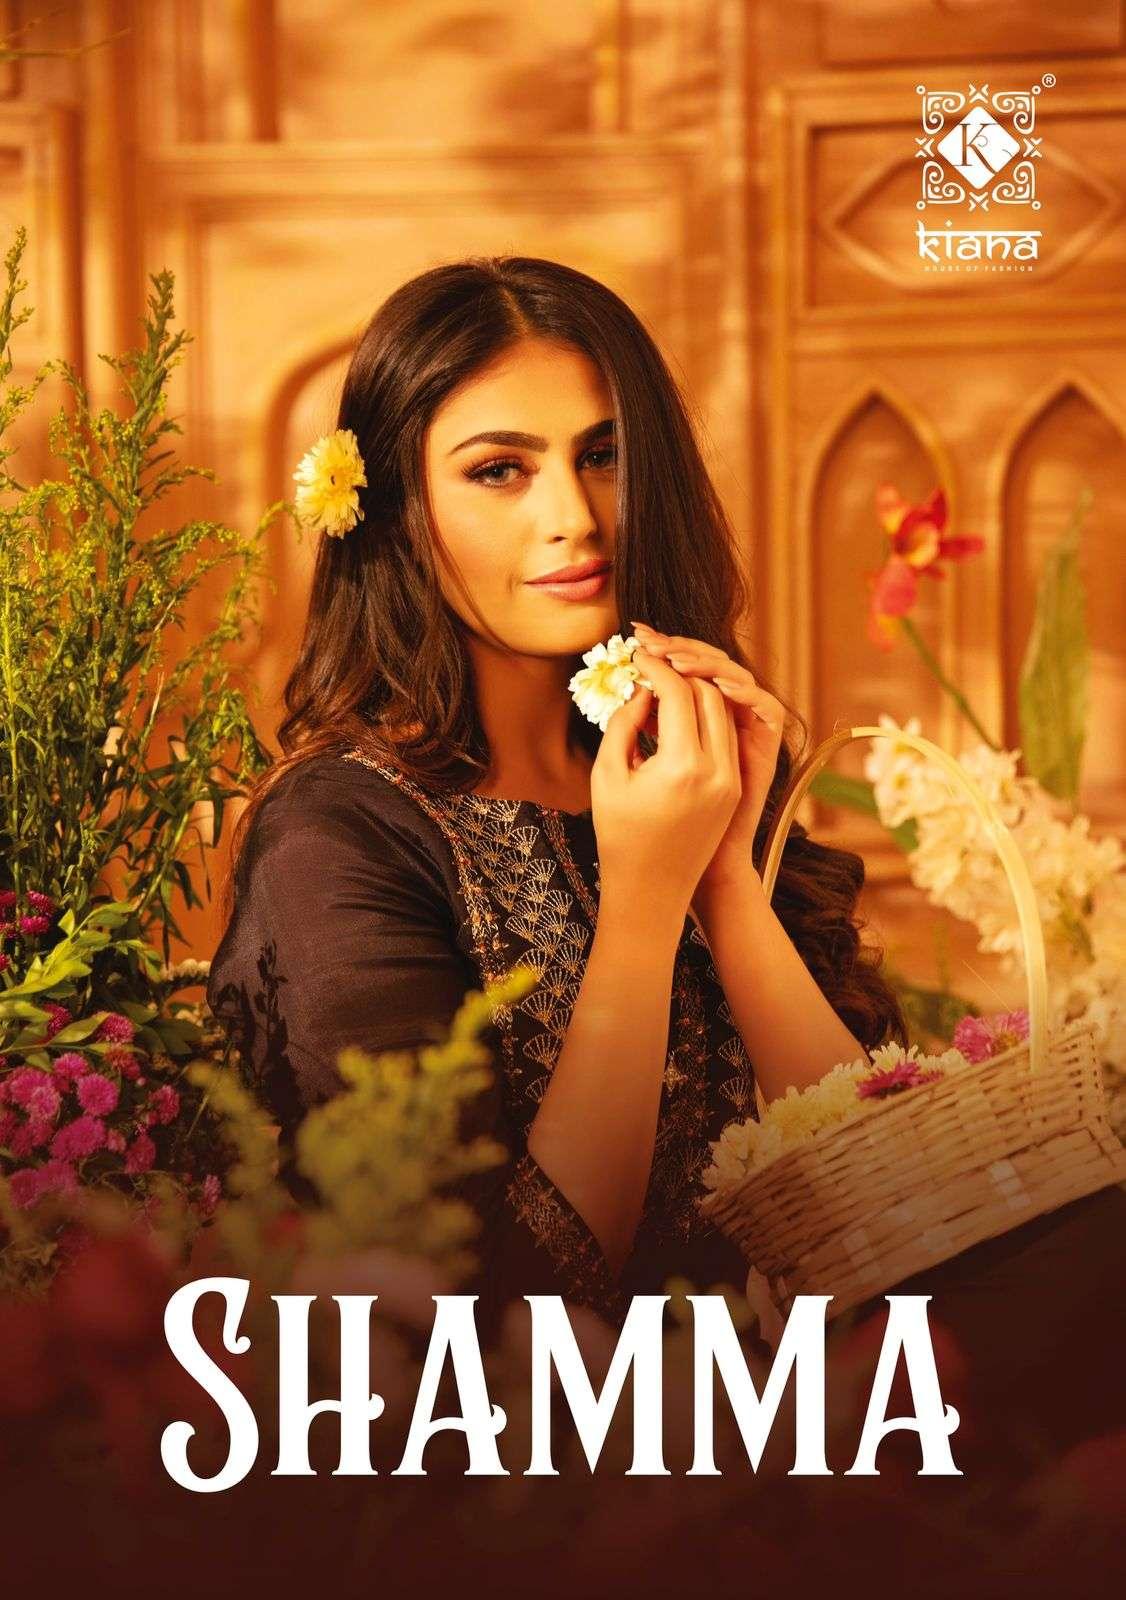 Shamma Readymade Designer Classy Salwar Kameez By Kiana House Of Fashion